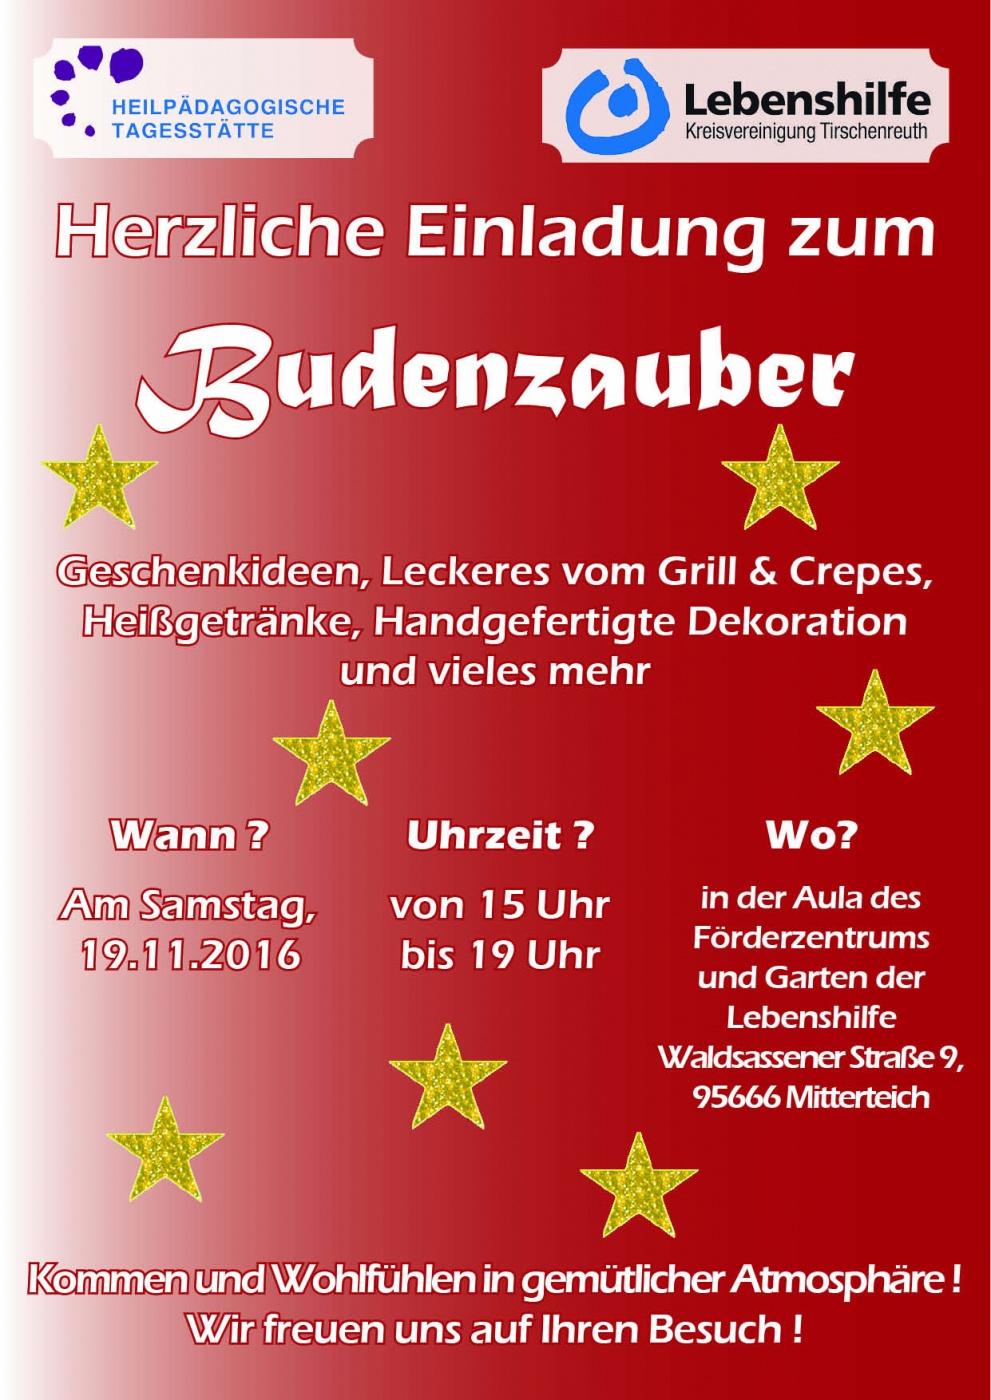 Plakat des Budenzaubers